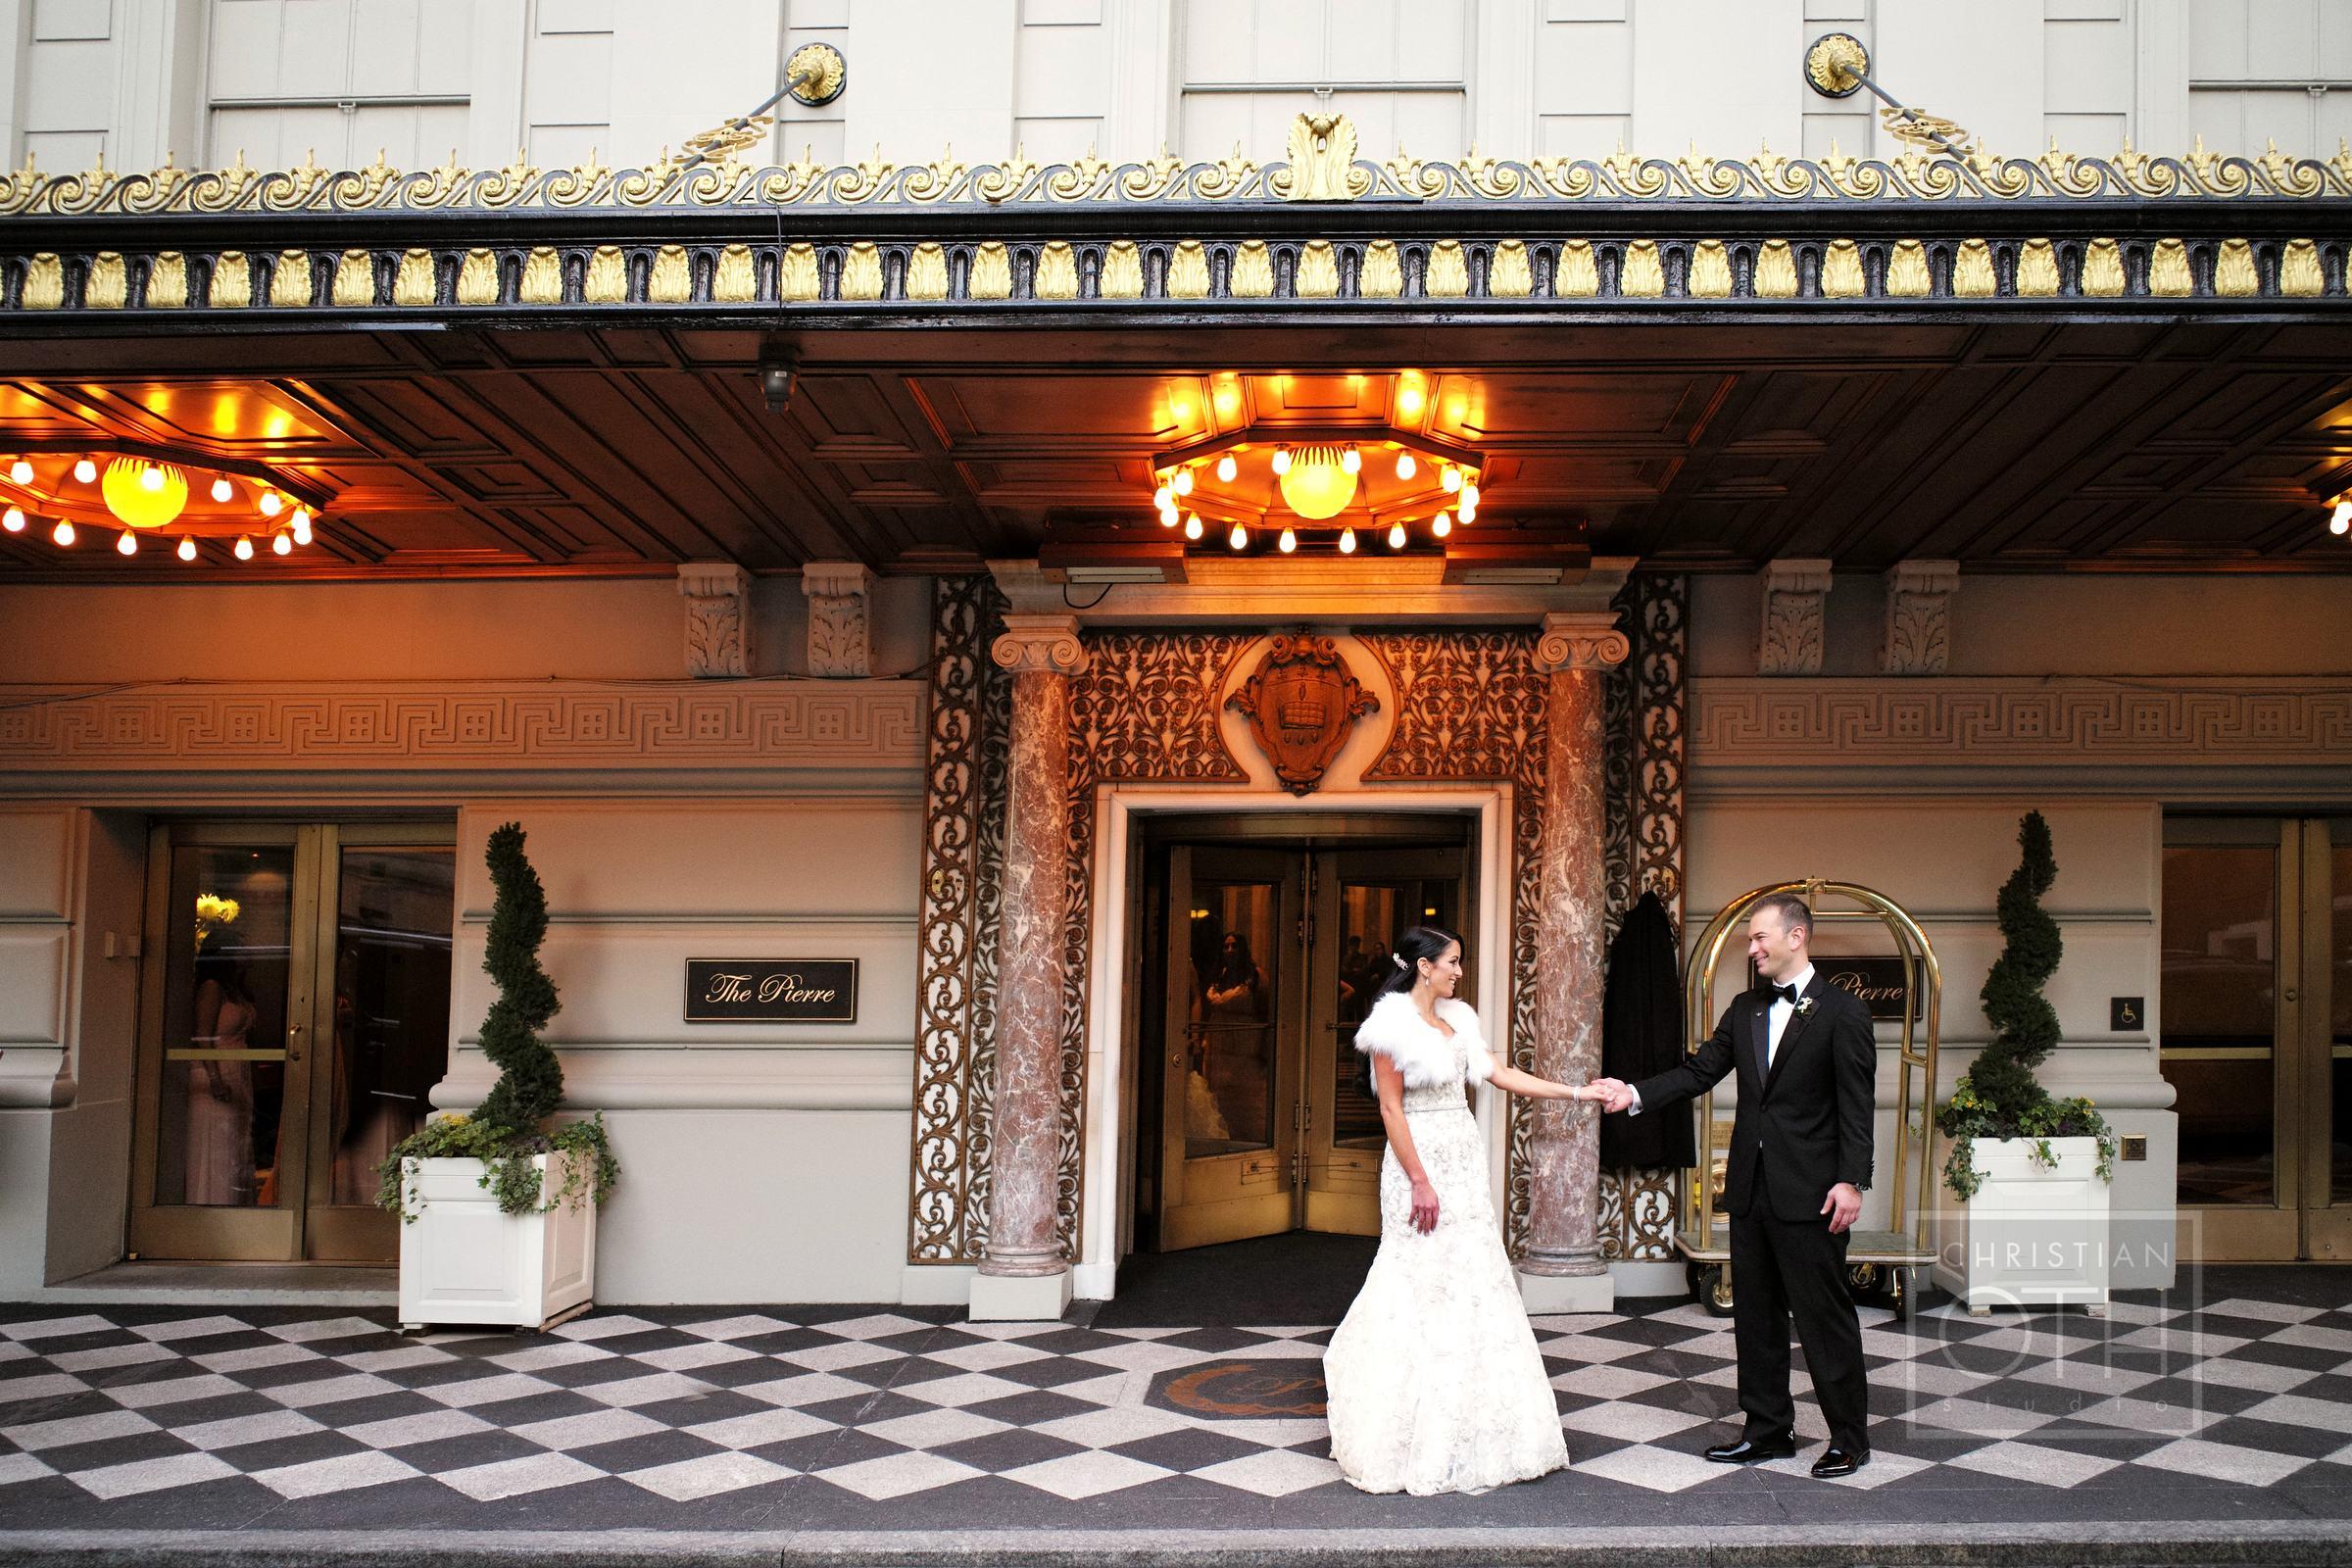 Ceci_New_York_Custom_Invitation_Pierre__City_ Destination_Wedding_Luxury_Personalized_Ceci_Style_Bride_Rose_Gold_Foil_Stamping60.JPG